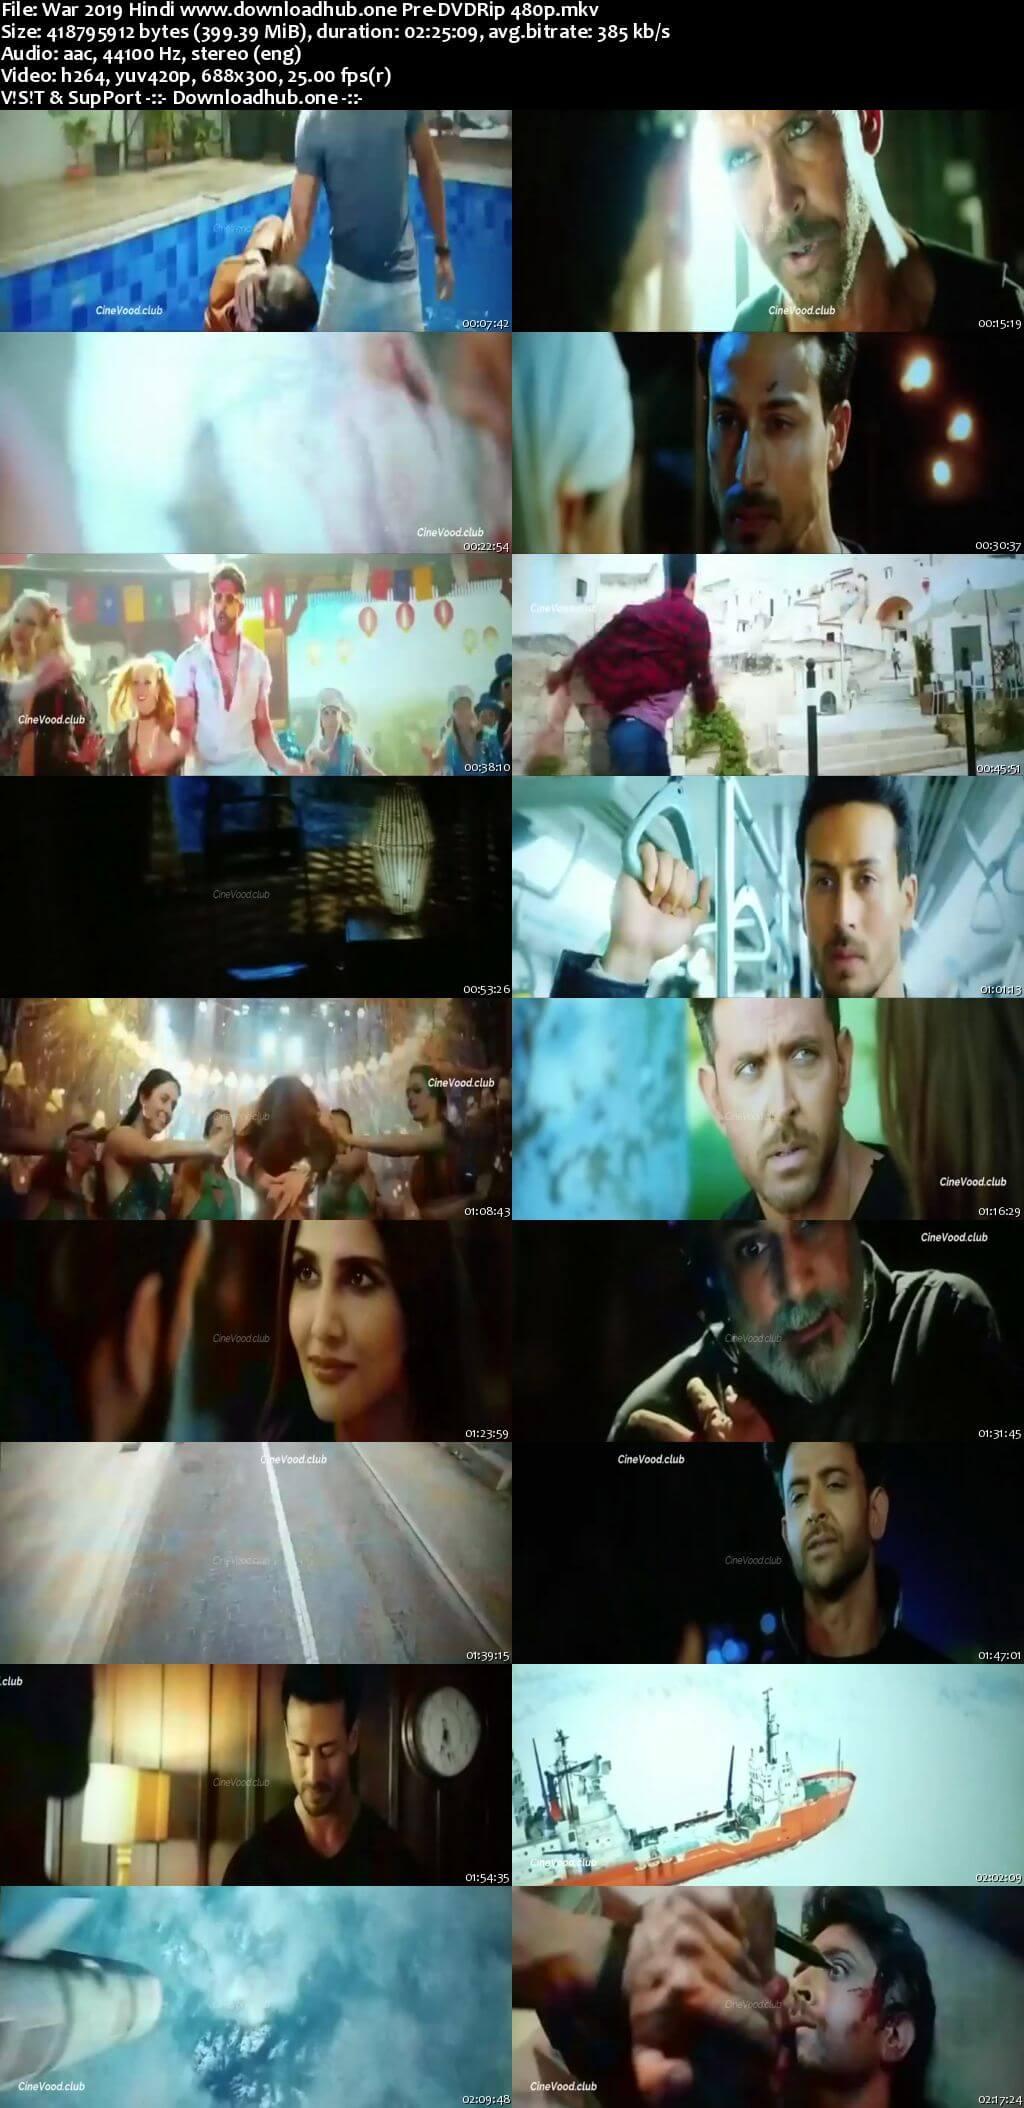 War 2019 Hindi 400MB Pre-DVDRip 480p